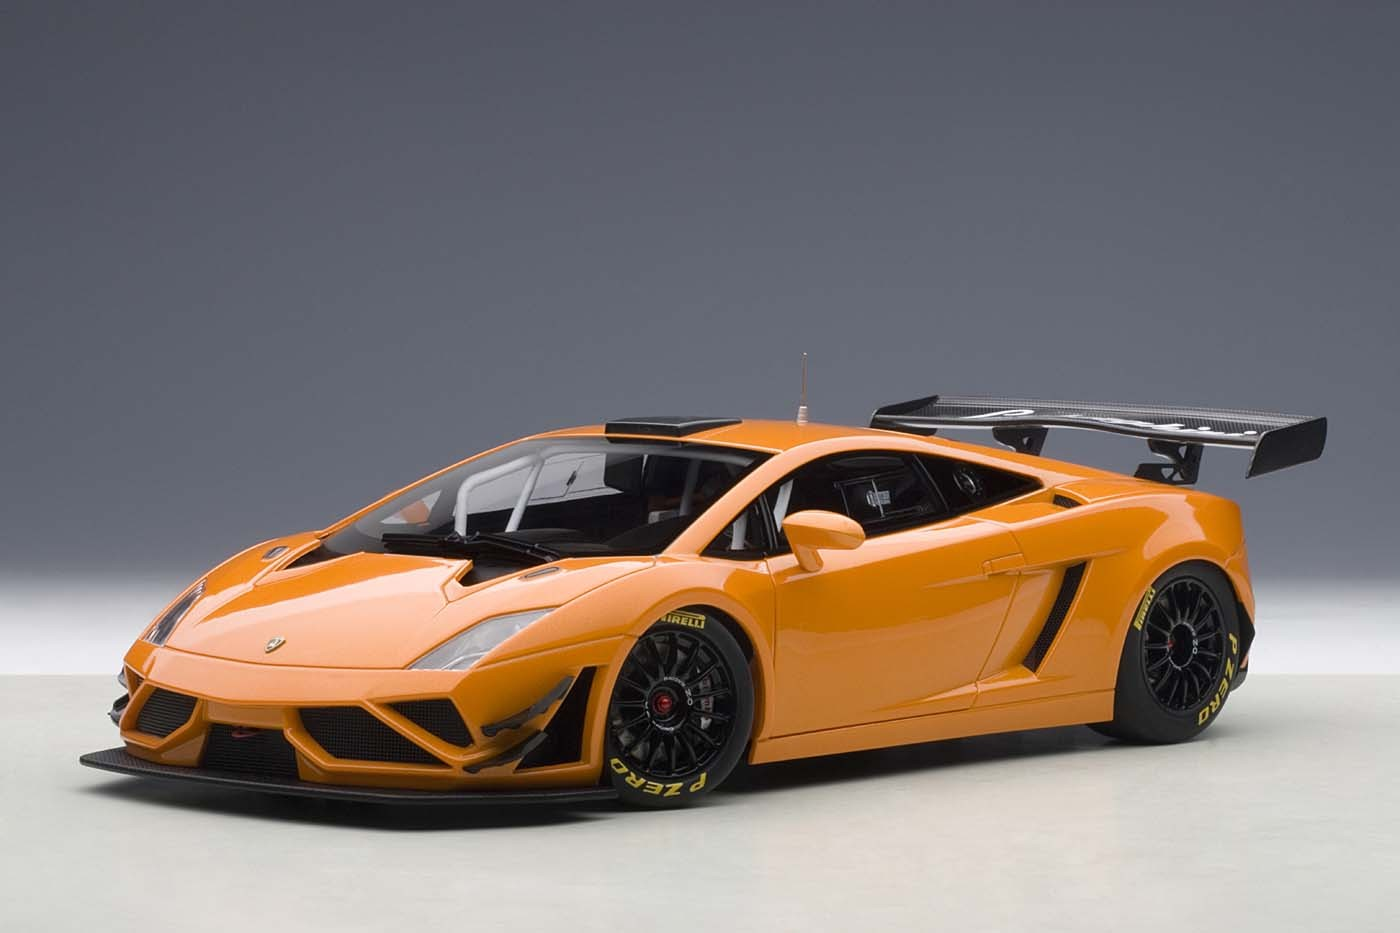 Highly Detailed Autoart Diecast Model Lamborghini Gallardo Gt3 Fl2